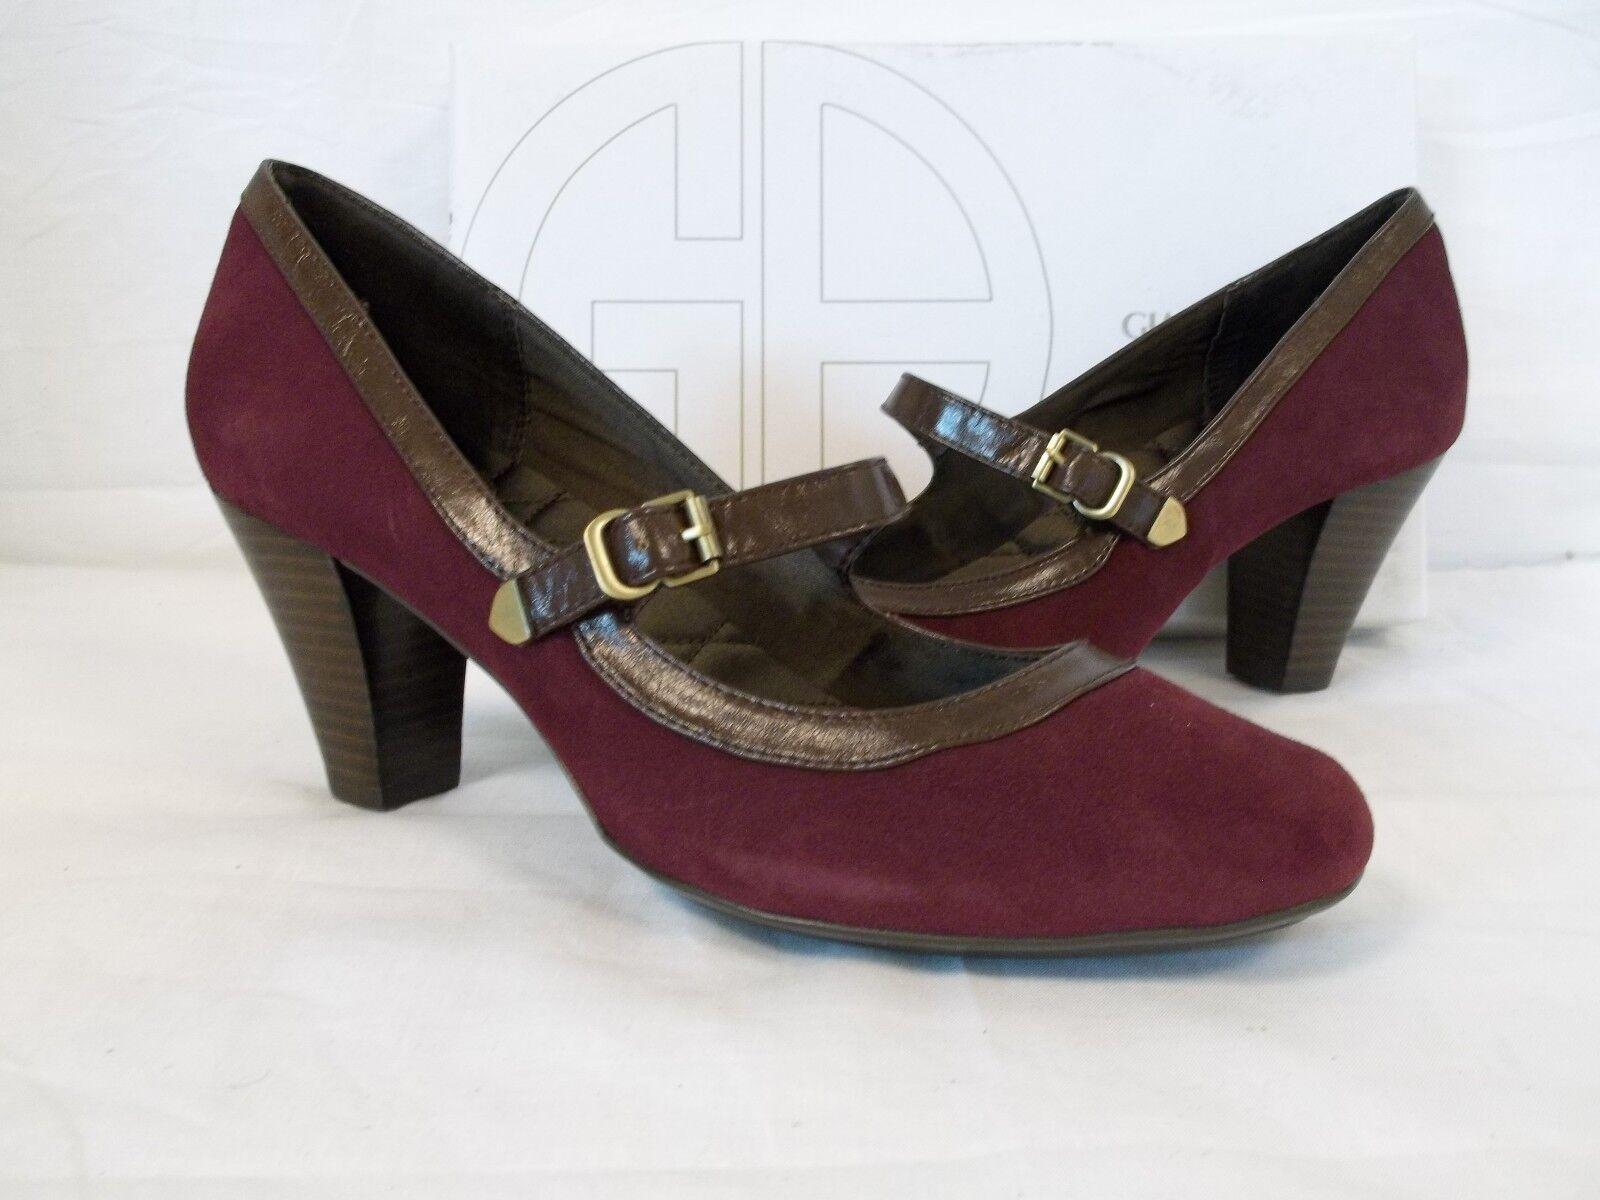 Giani Bernini Size 6 M Dawin Bordeaux Leather Mary Janes Heels New Womens Shoes